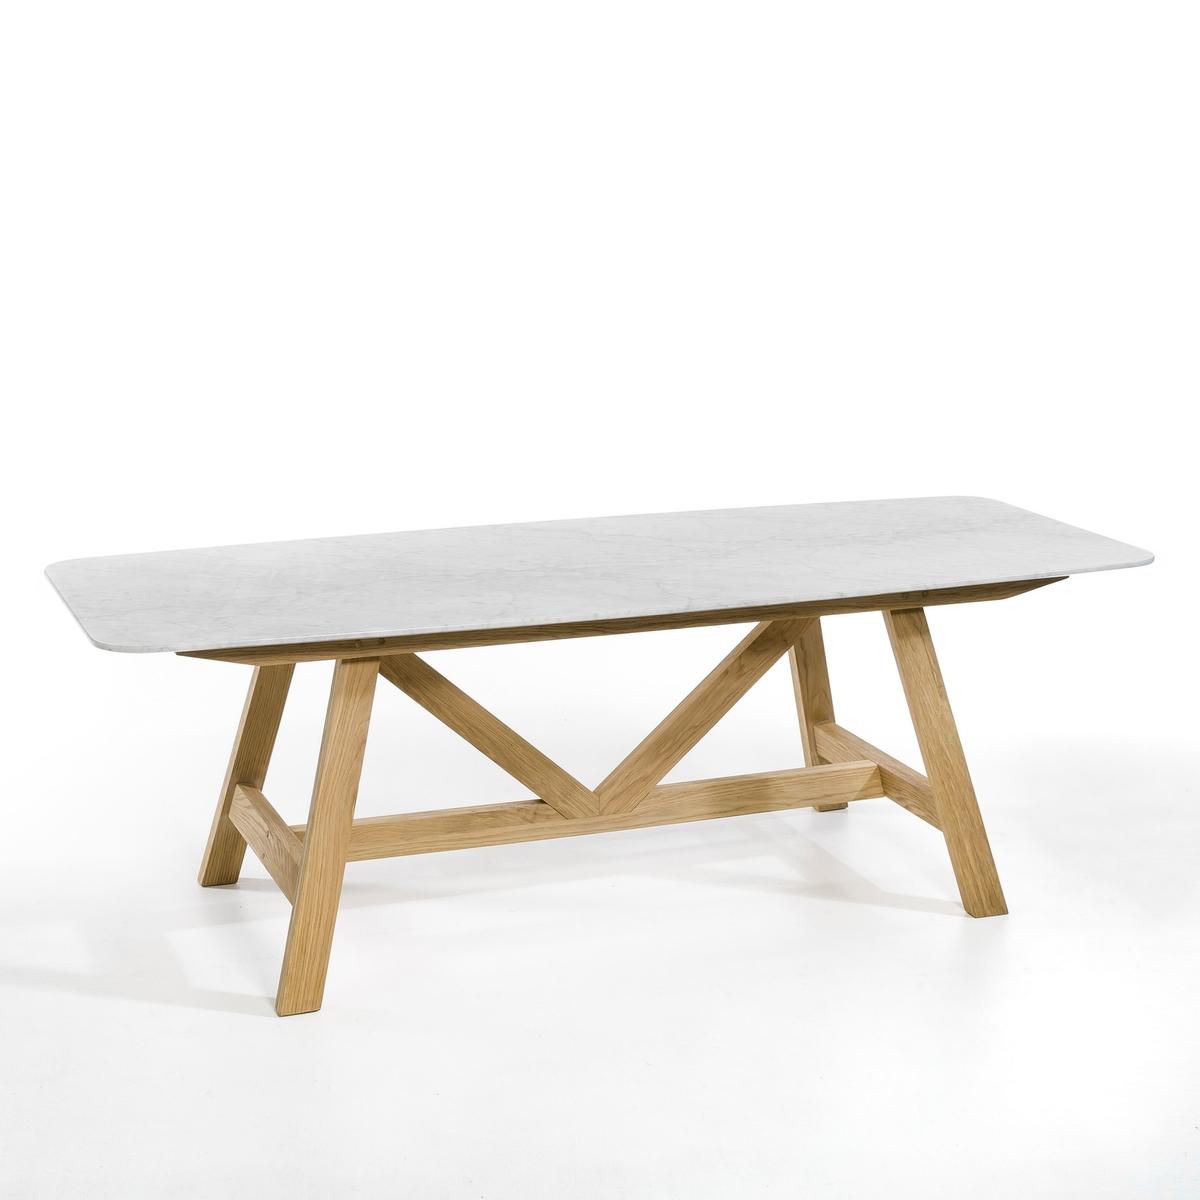 Стол из мрамора Buondi, дизайн Э. Галлина